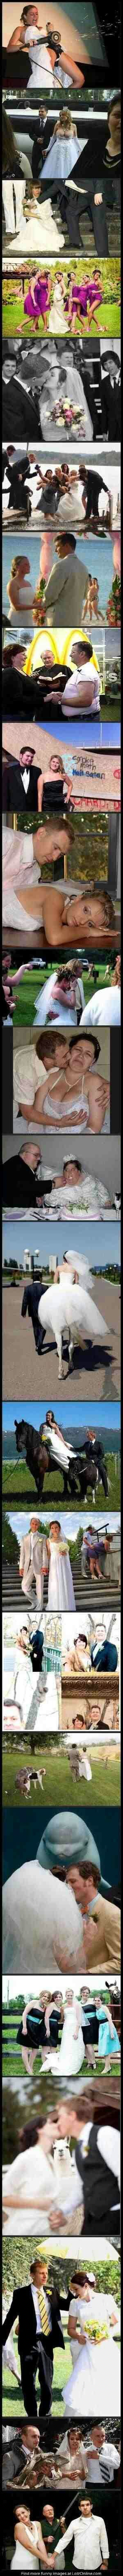 Wedding pic fails